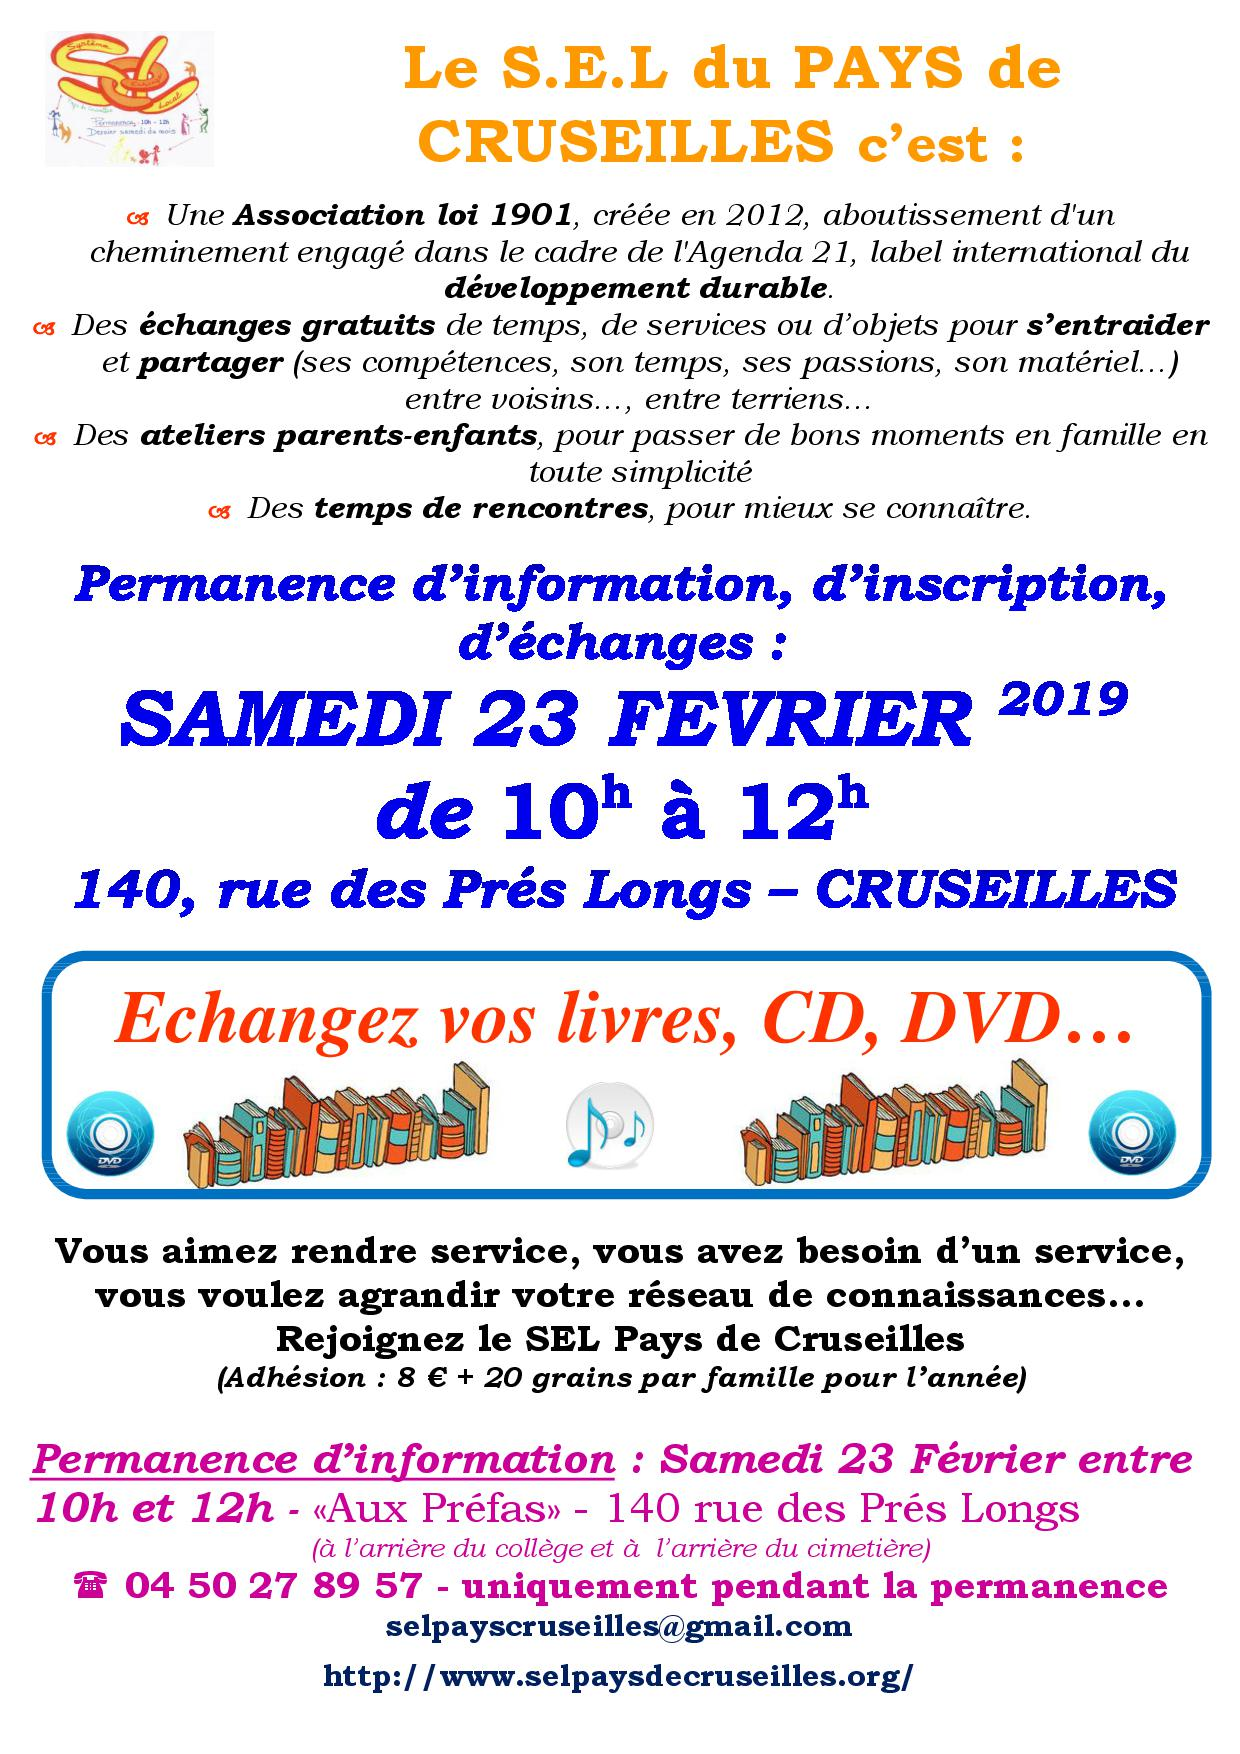 C_Users_Anne-cecile_Desktop_Flyer 2019.02.23